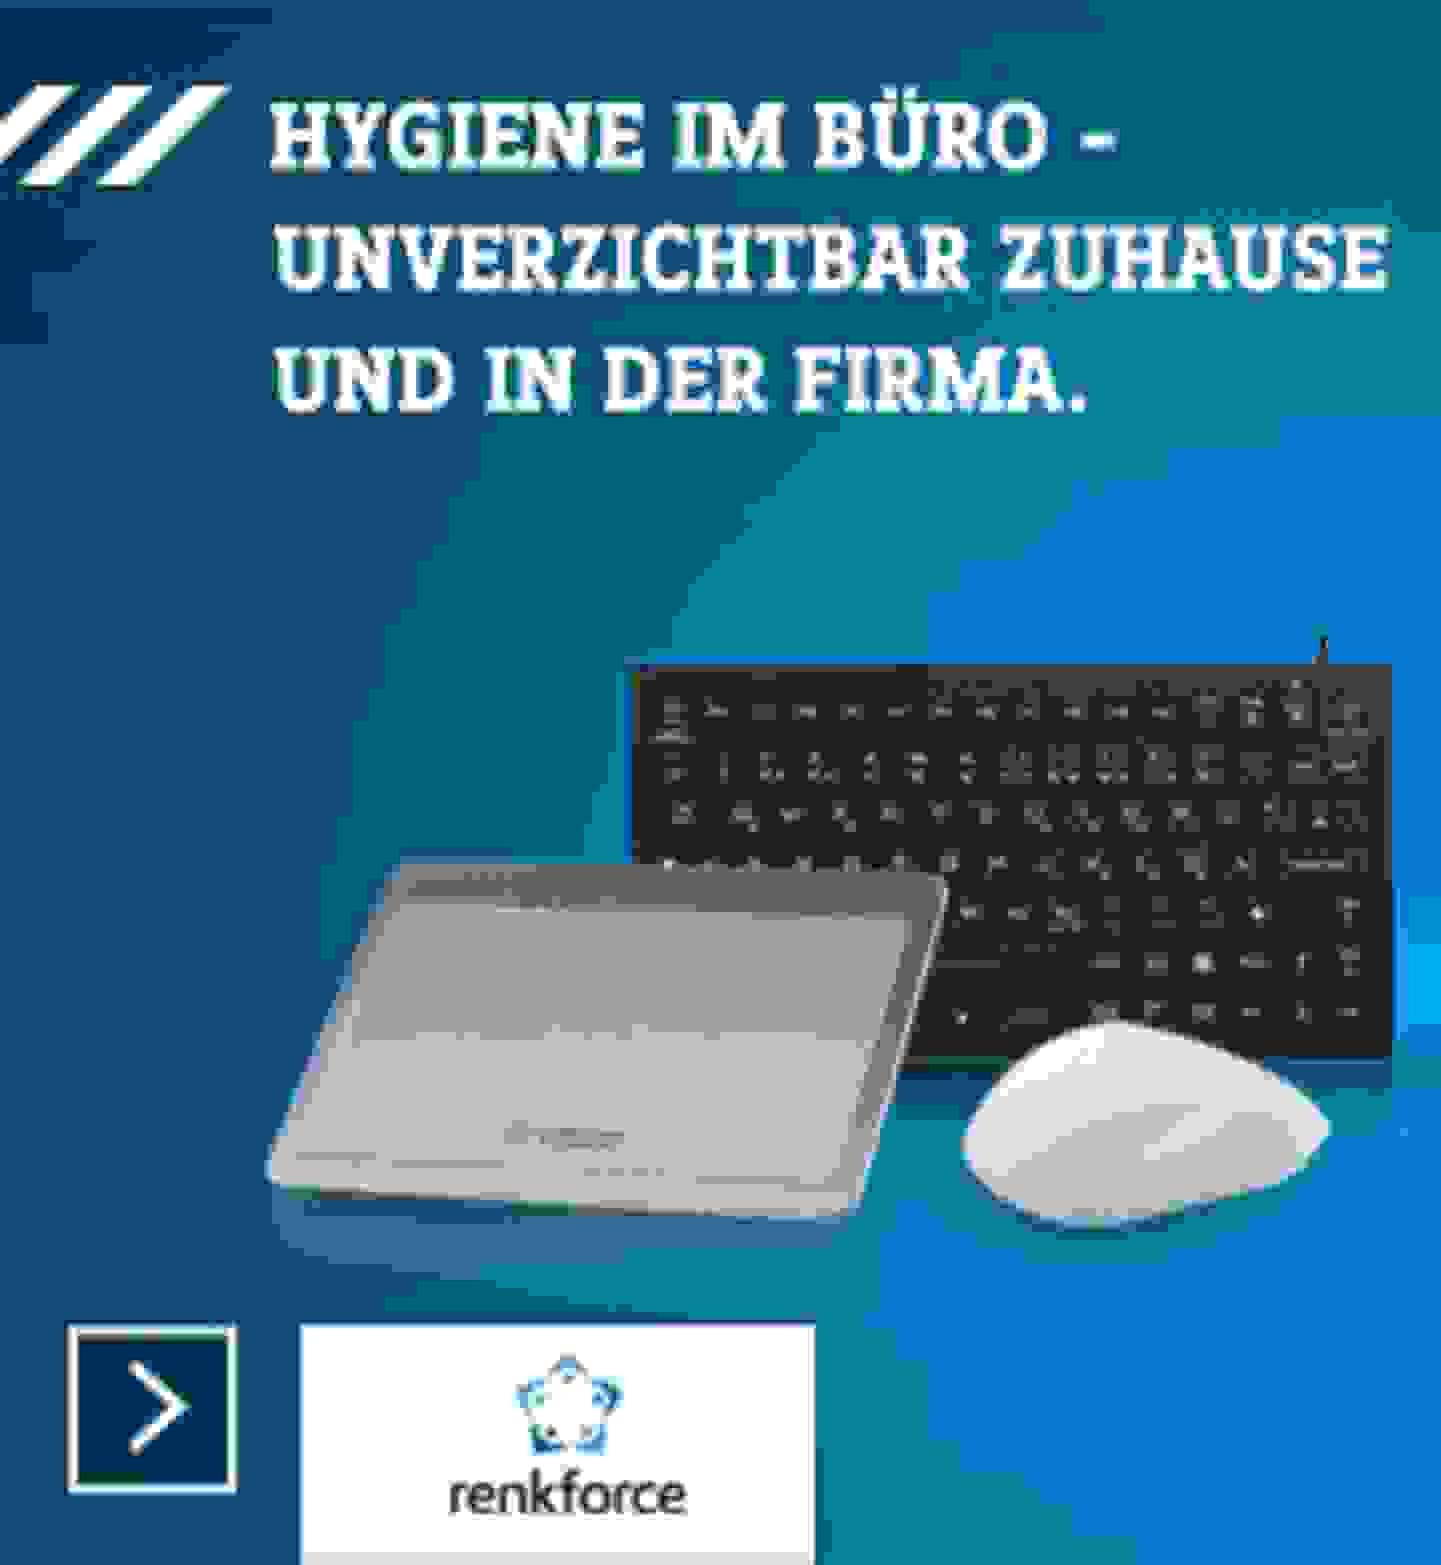 Hygiene im Büro